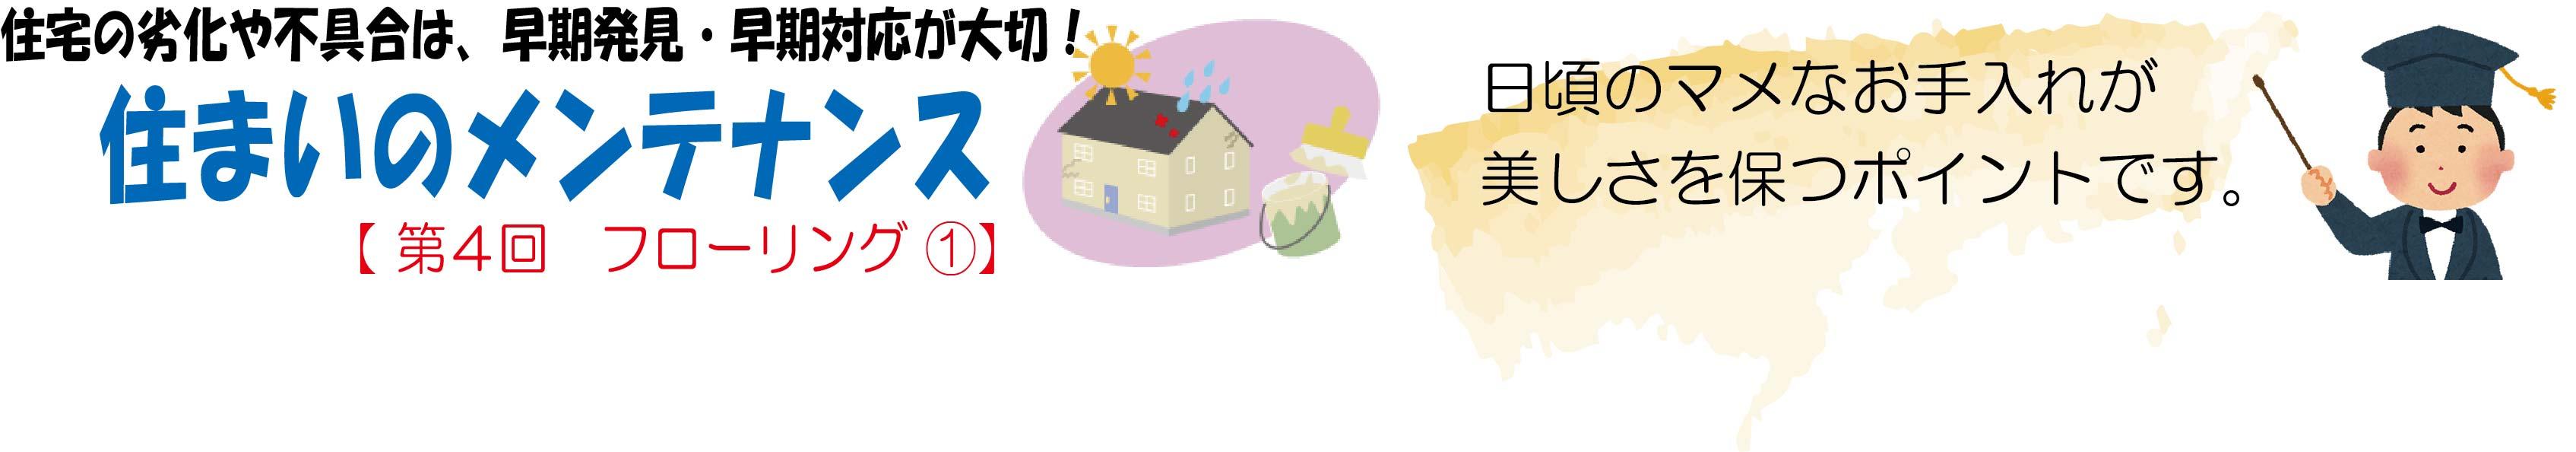 KuraSi-natu-sin85-15.jpg